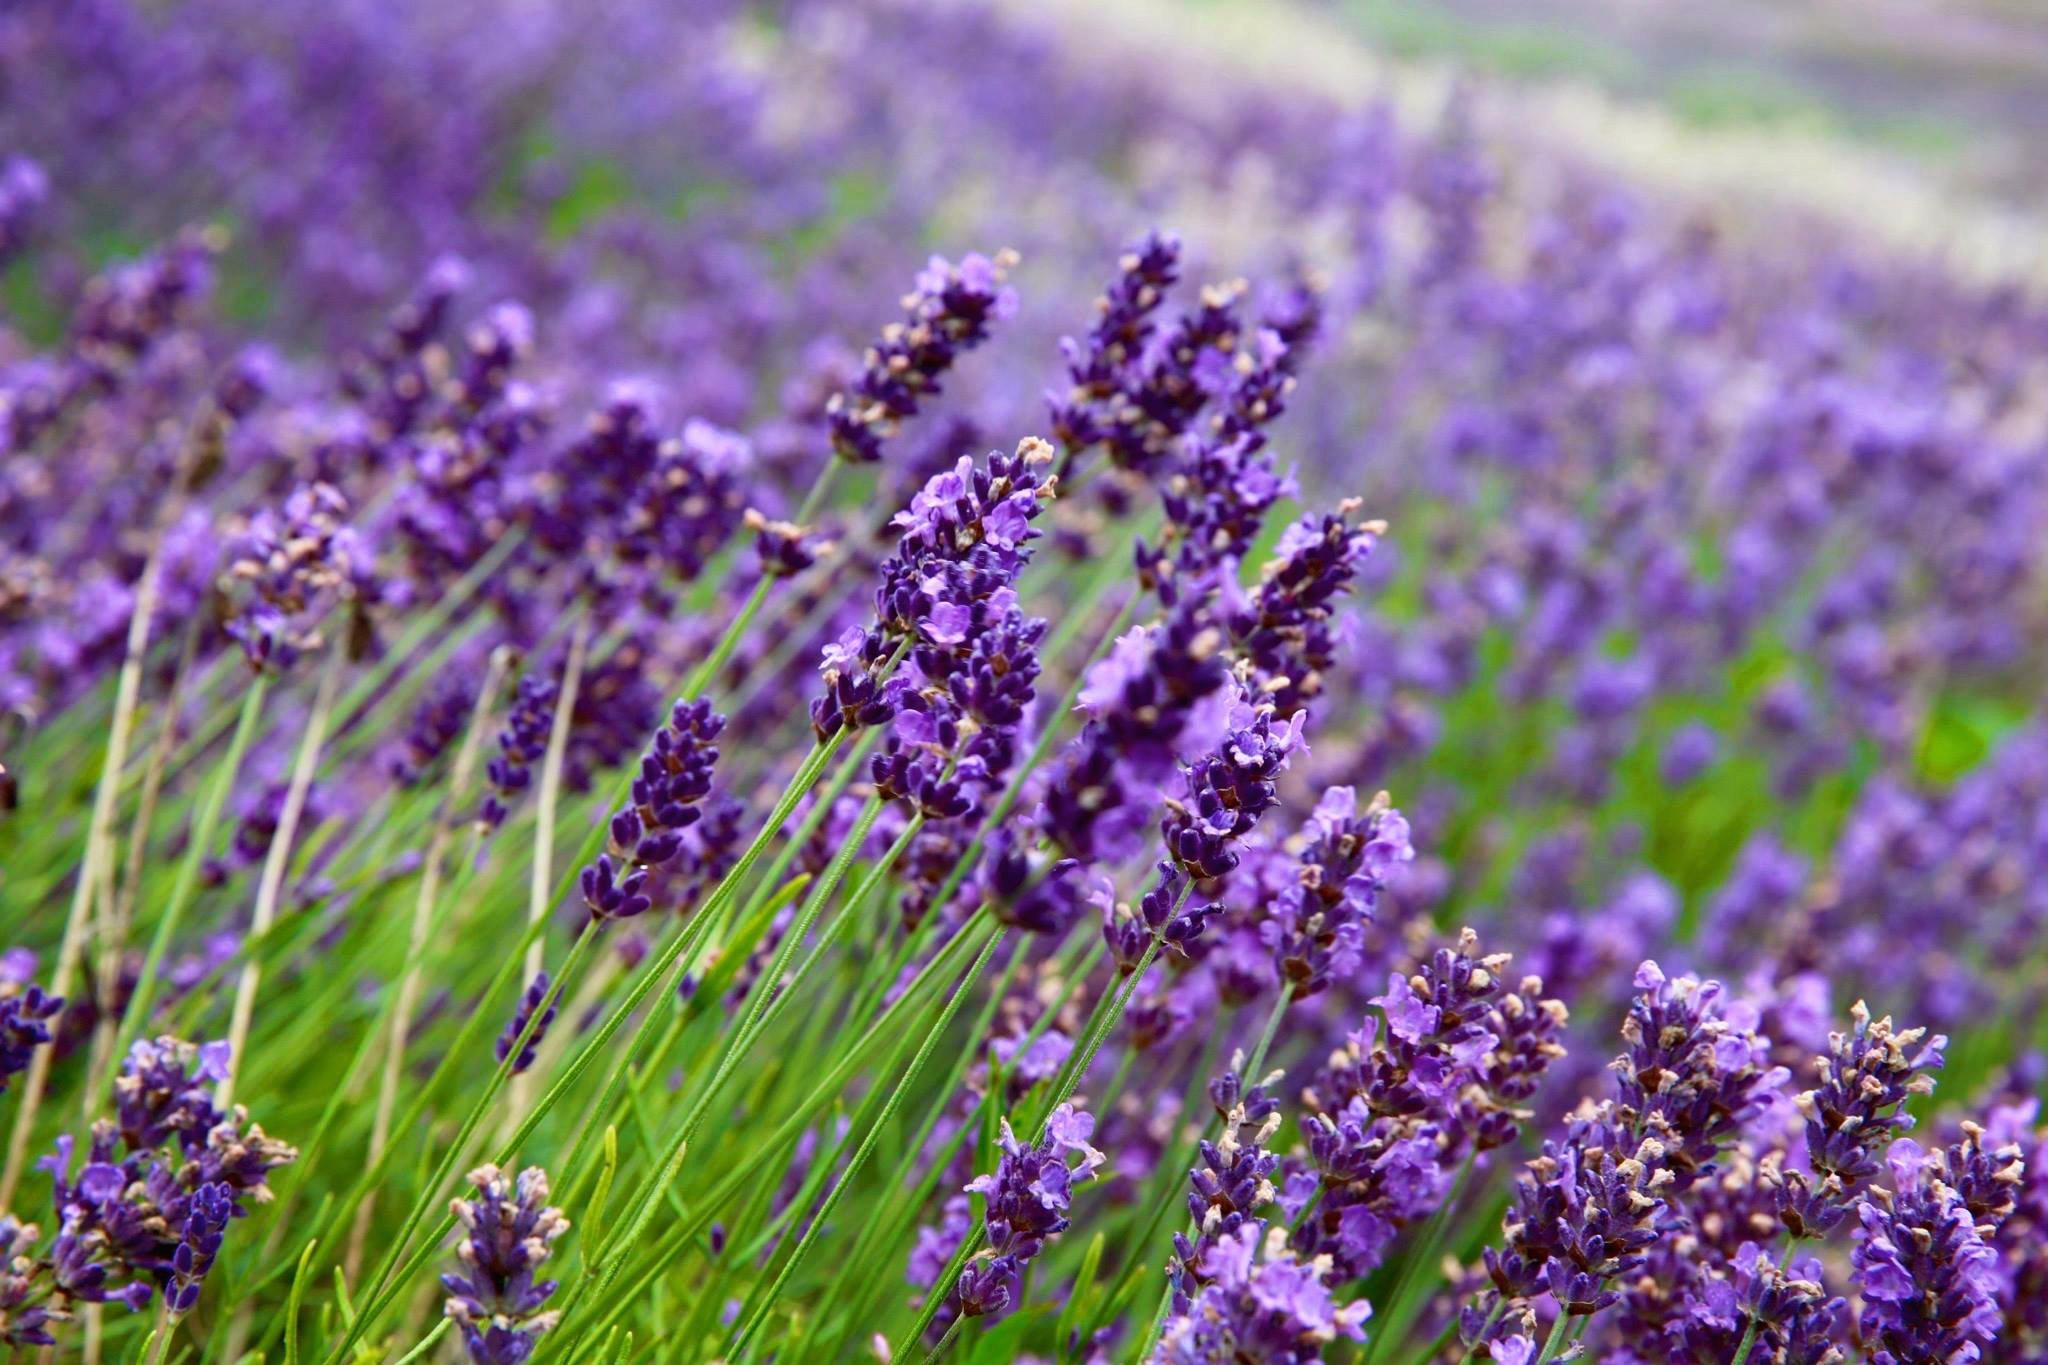 Yorkshire lavender